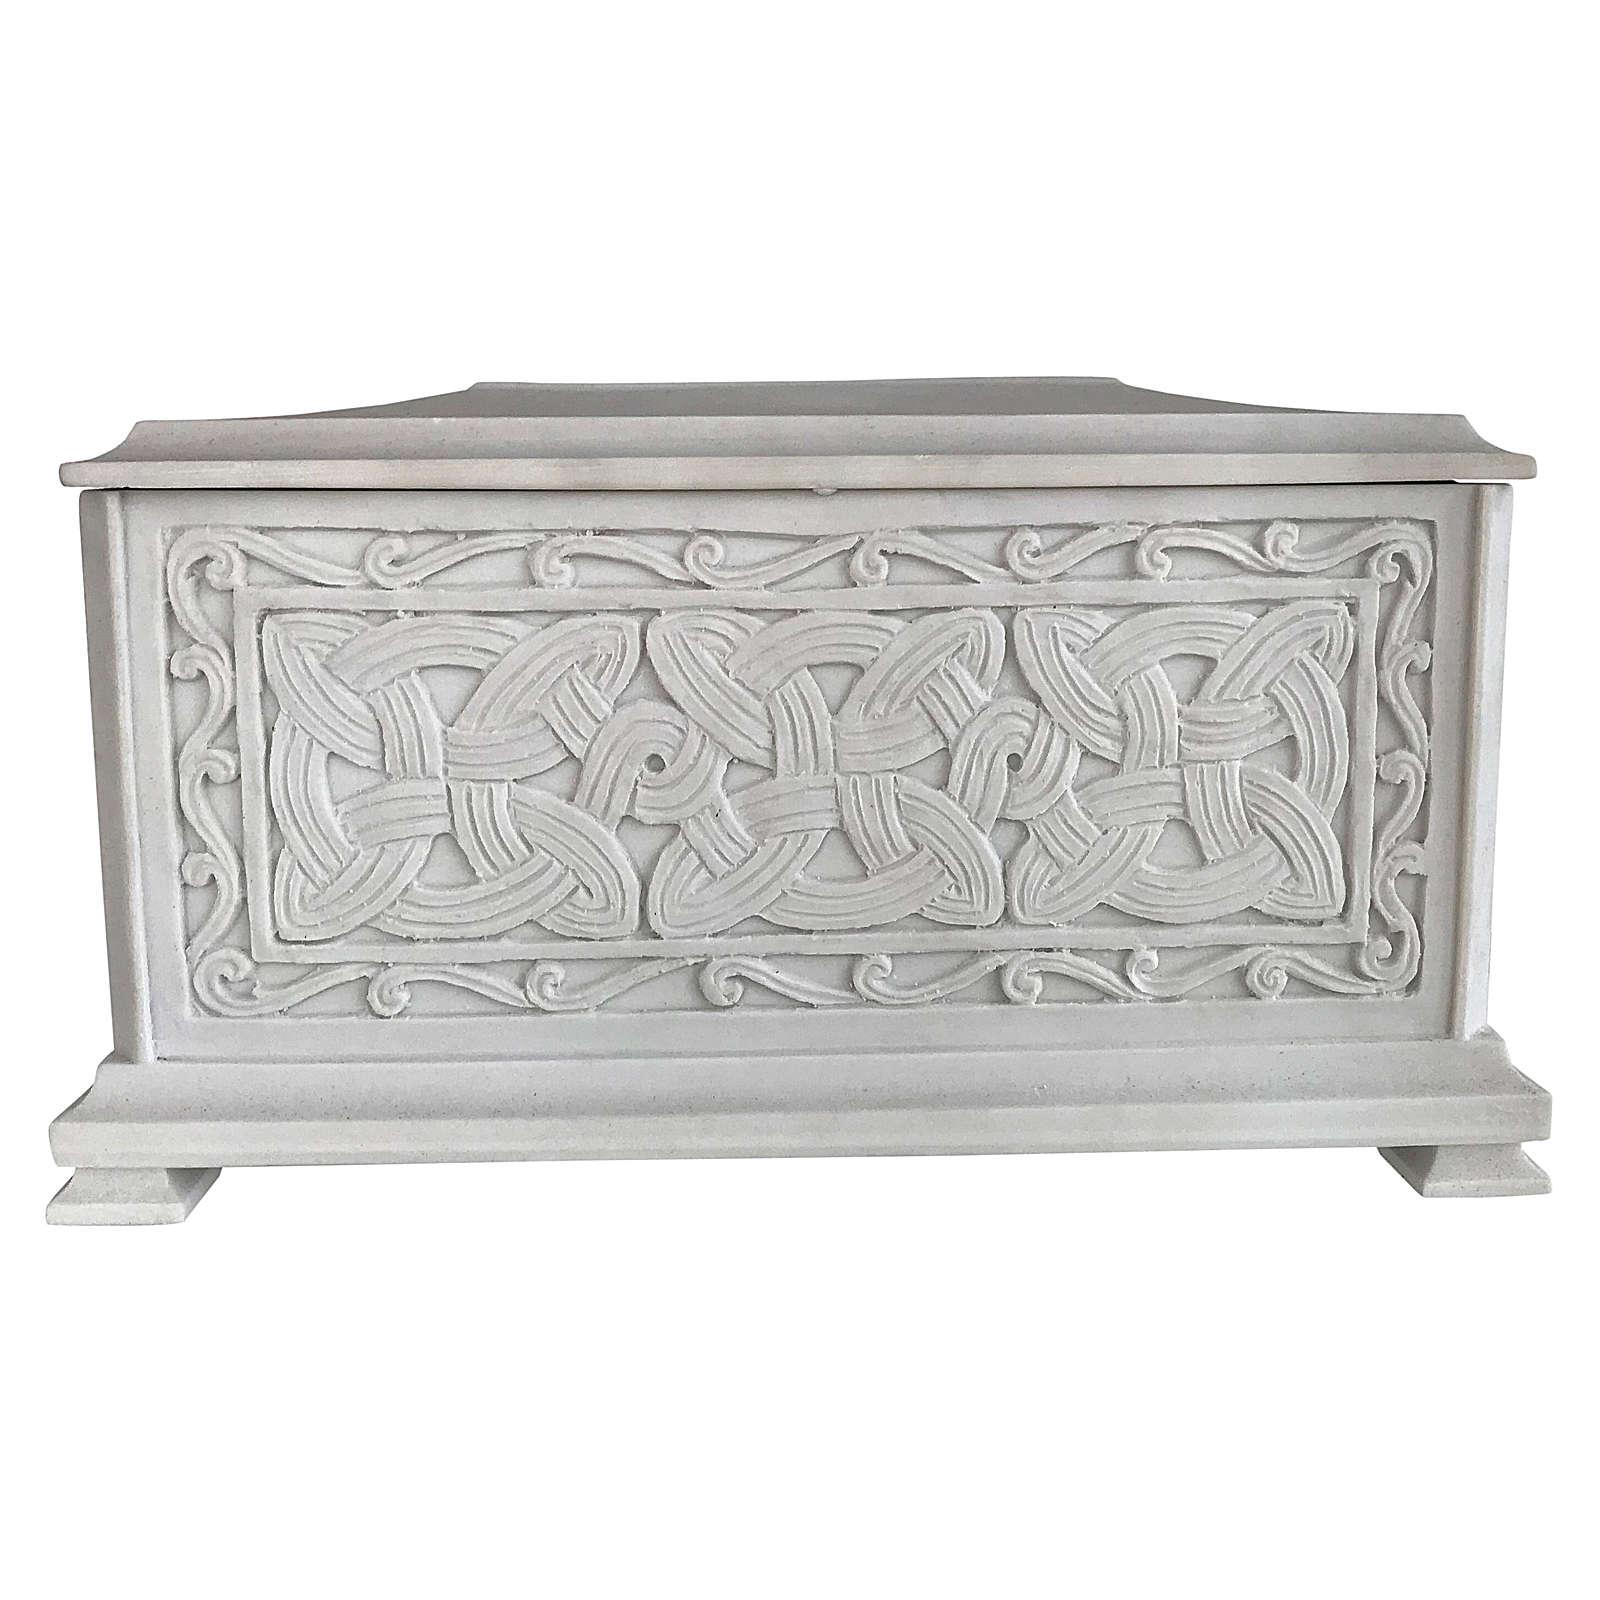 Urna funebre Renaissance rettangolare polvere marmo levigata 3